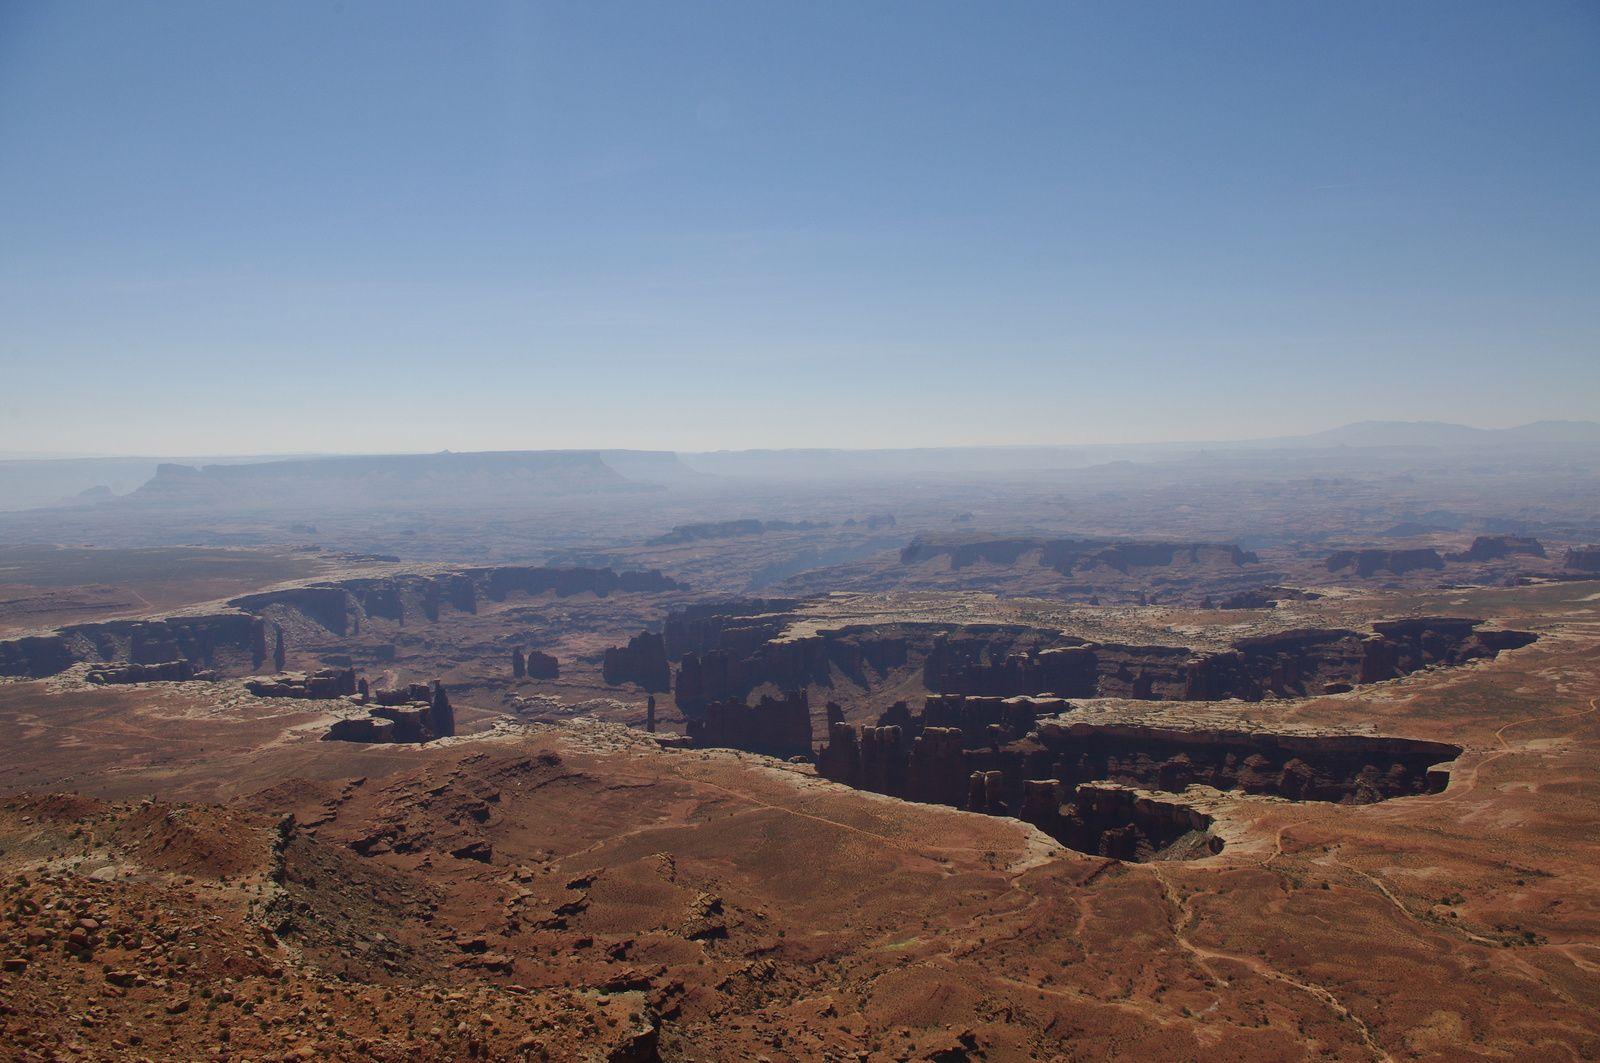 USA Road Trip - Jour 15/25 - Canyonlands National Park - Dead Horse State Park